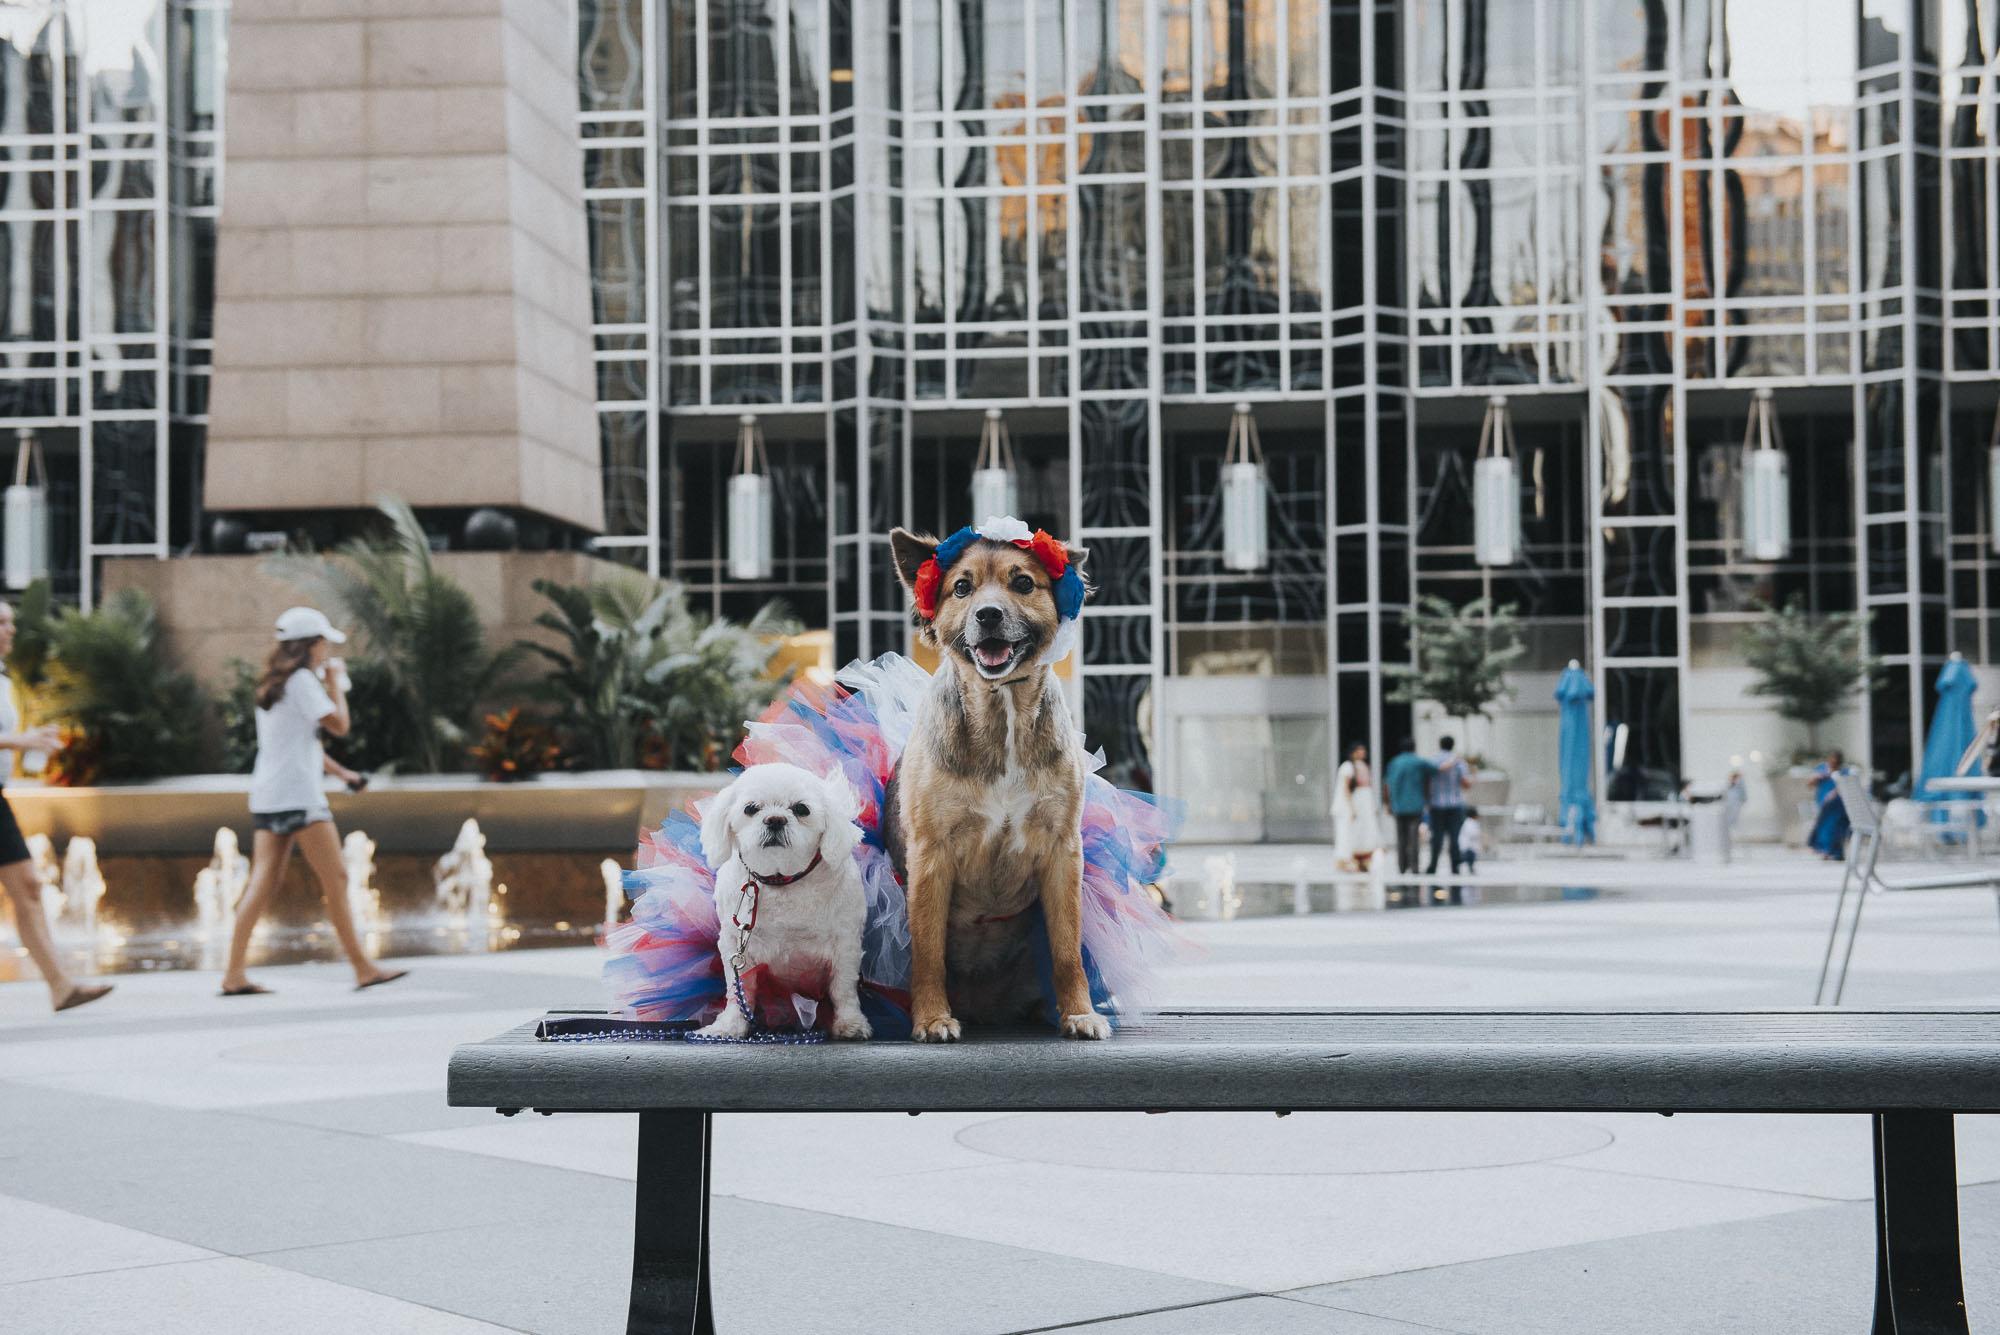 Dogs-ppg007190.JPG